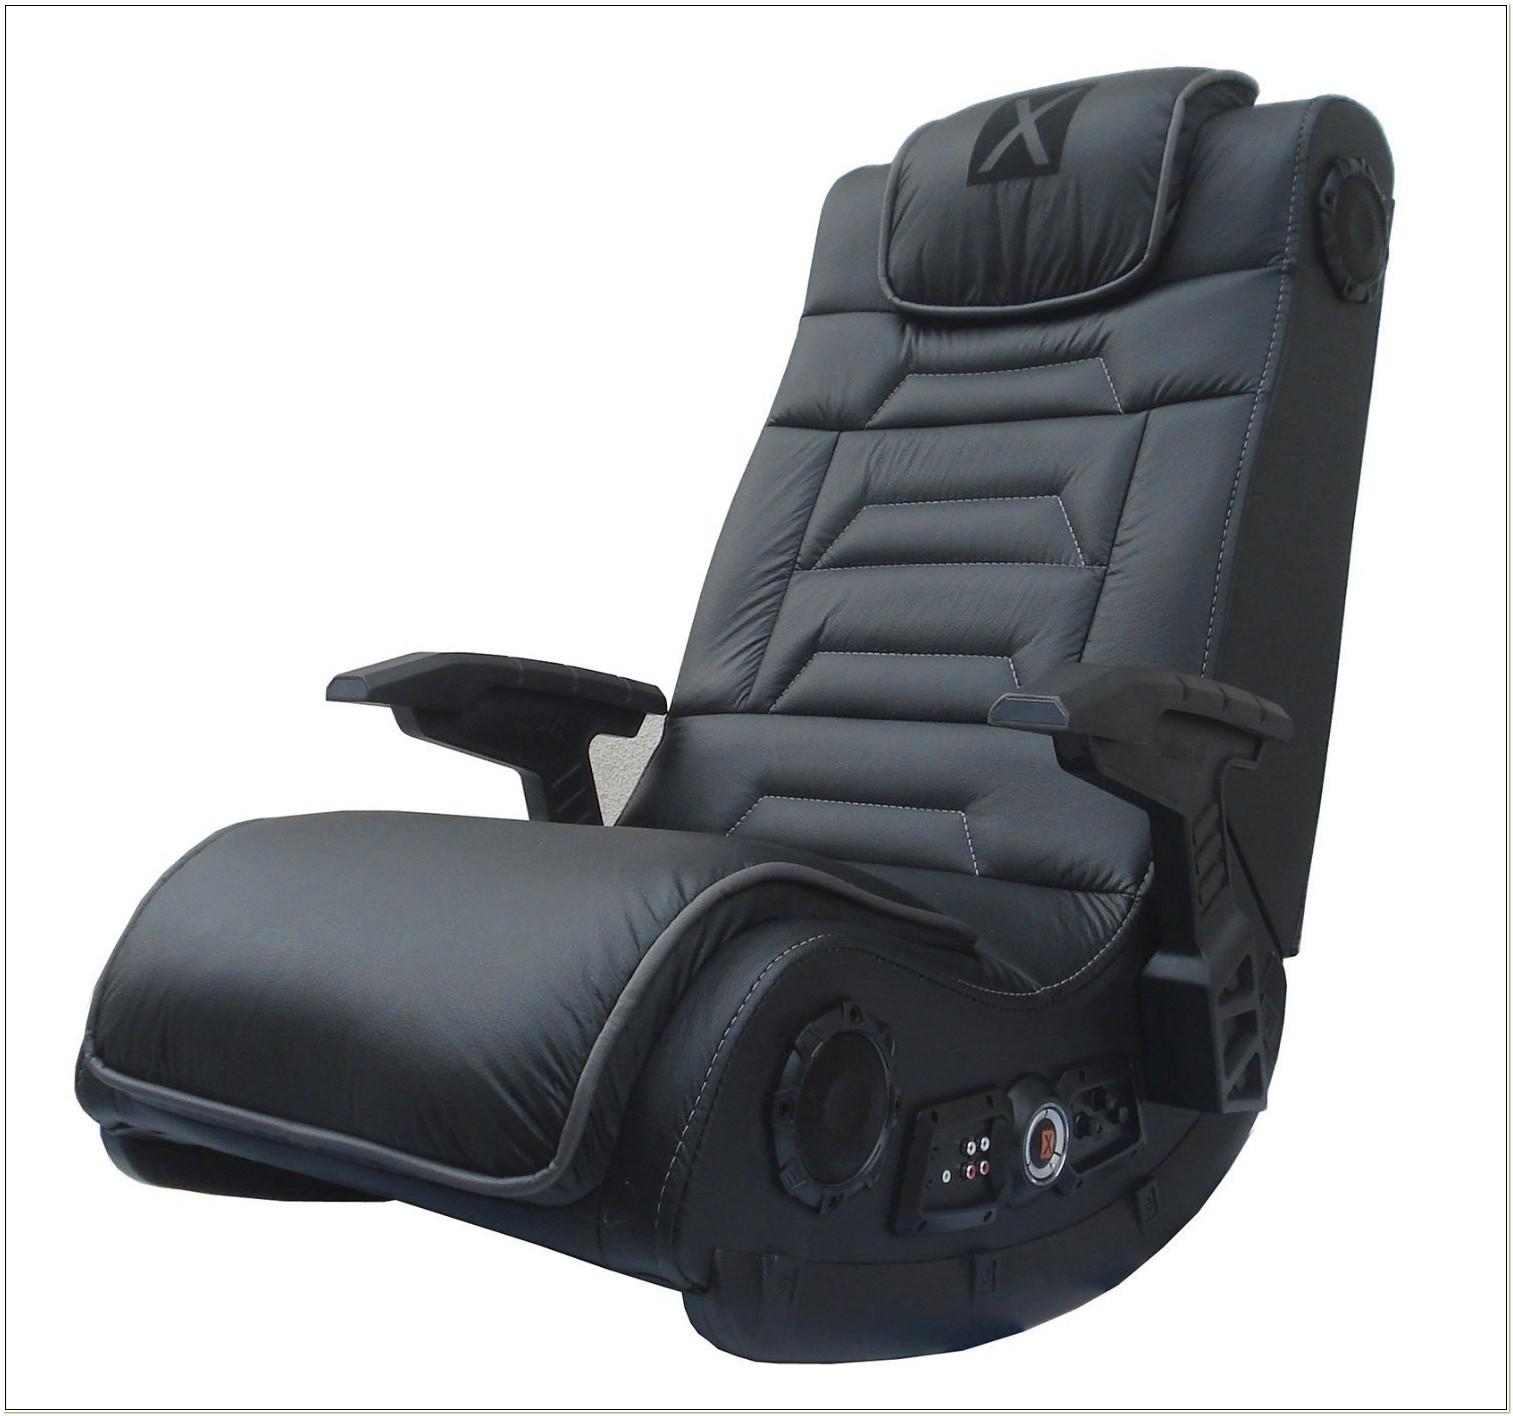 Cheapest X Rocker Pro Gaming Chair